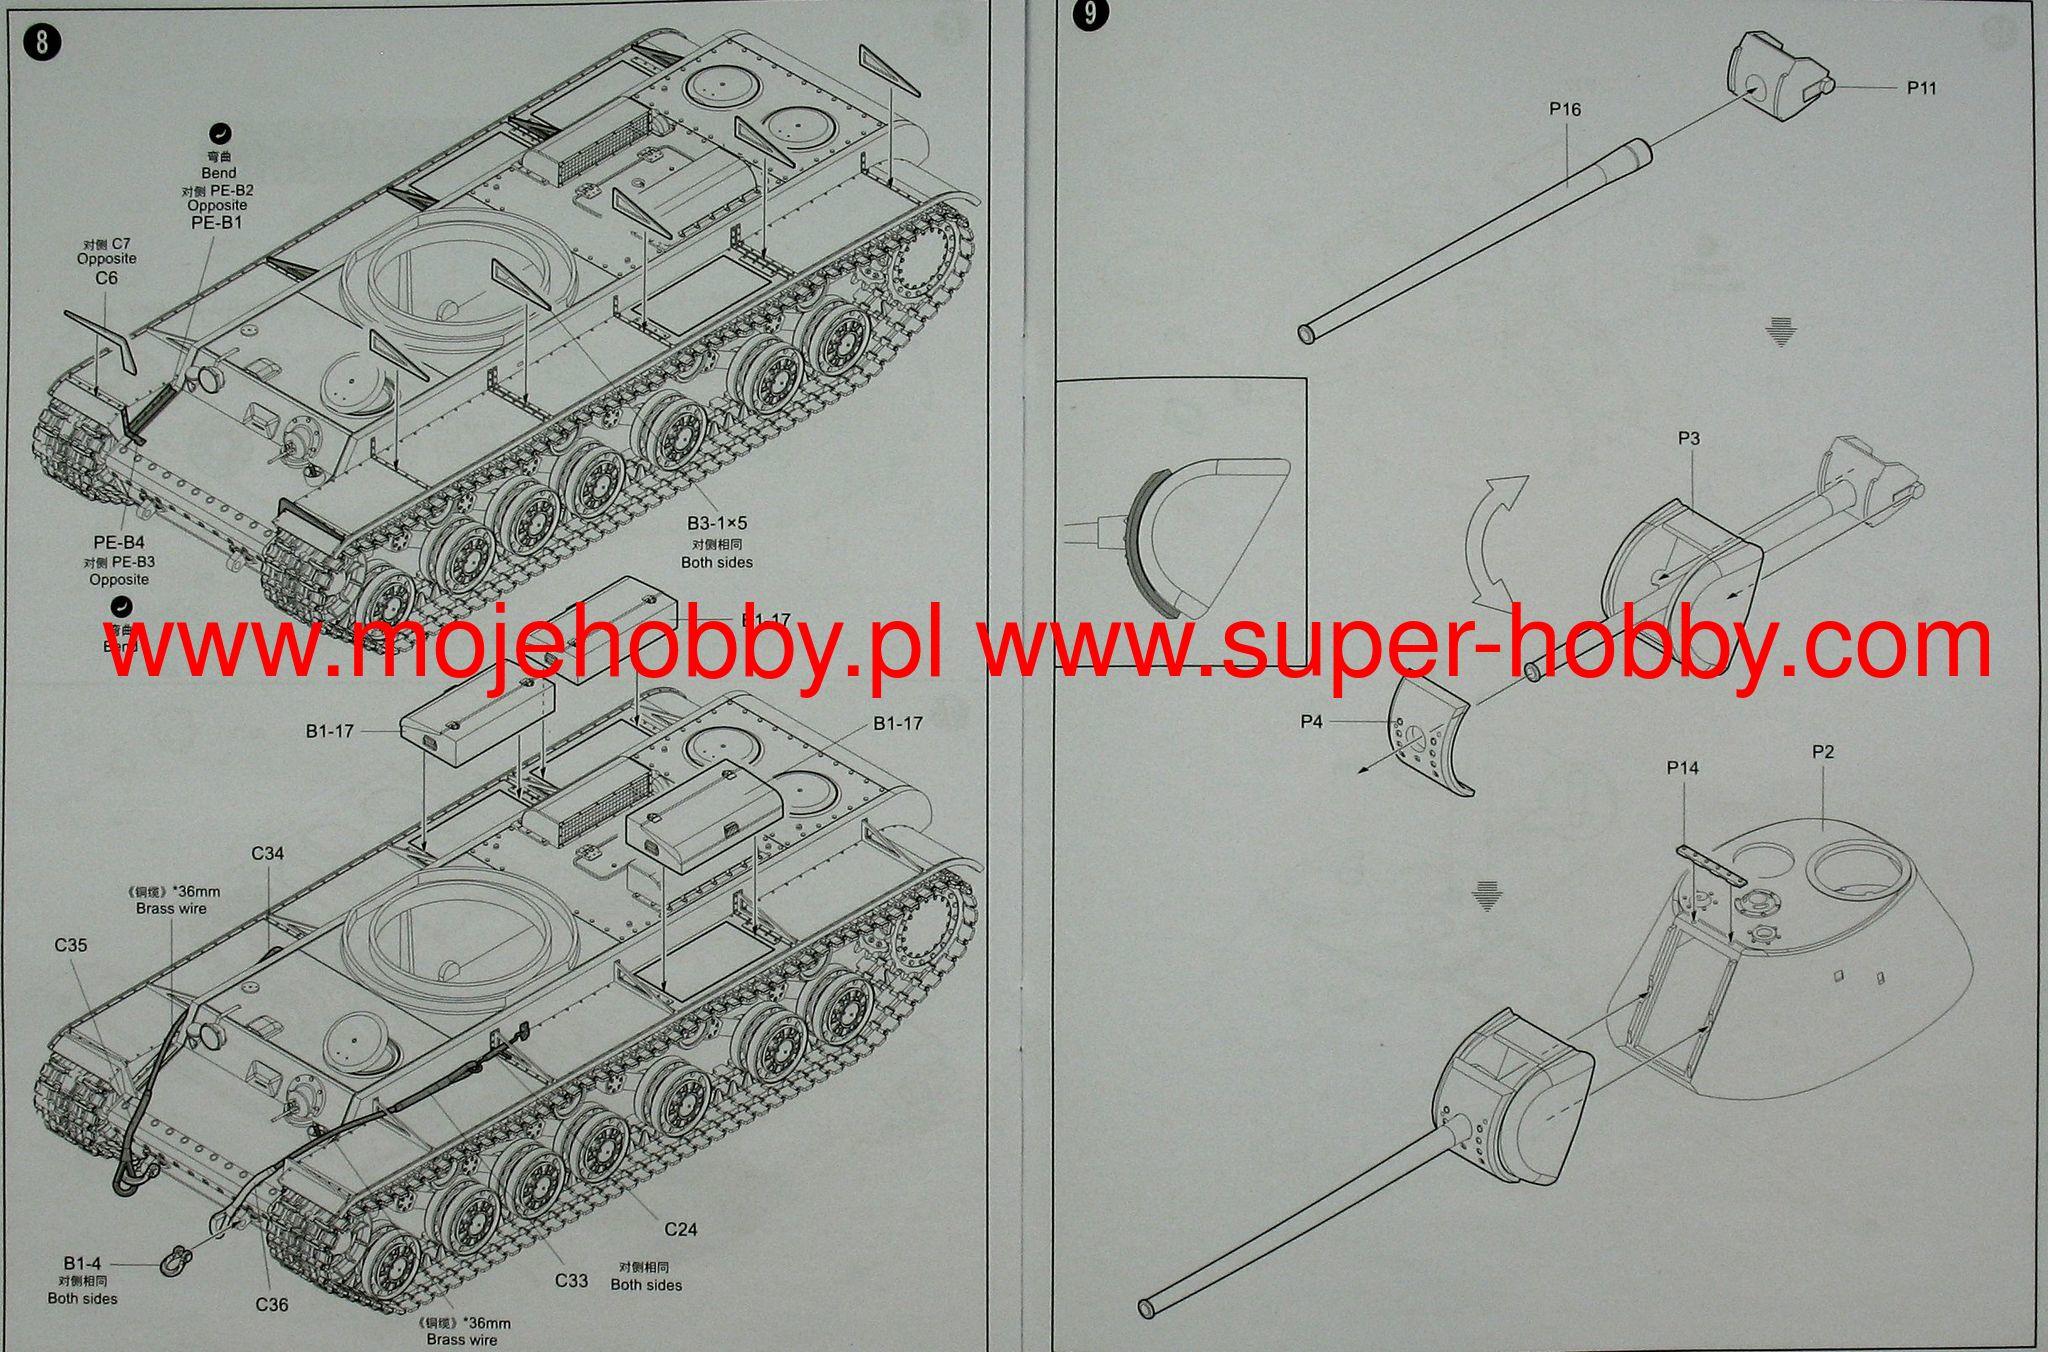 Russian Kv 3 Heavy Tank Trumpeter 09544 89 B2 Wiring Diagram 2 Tru09544 5